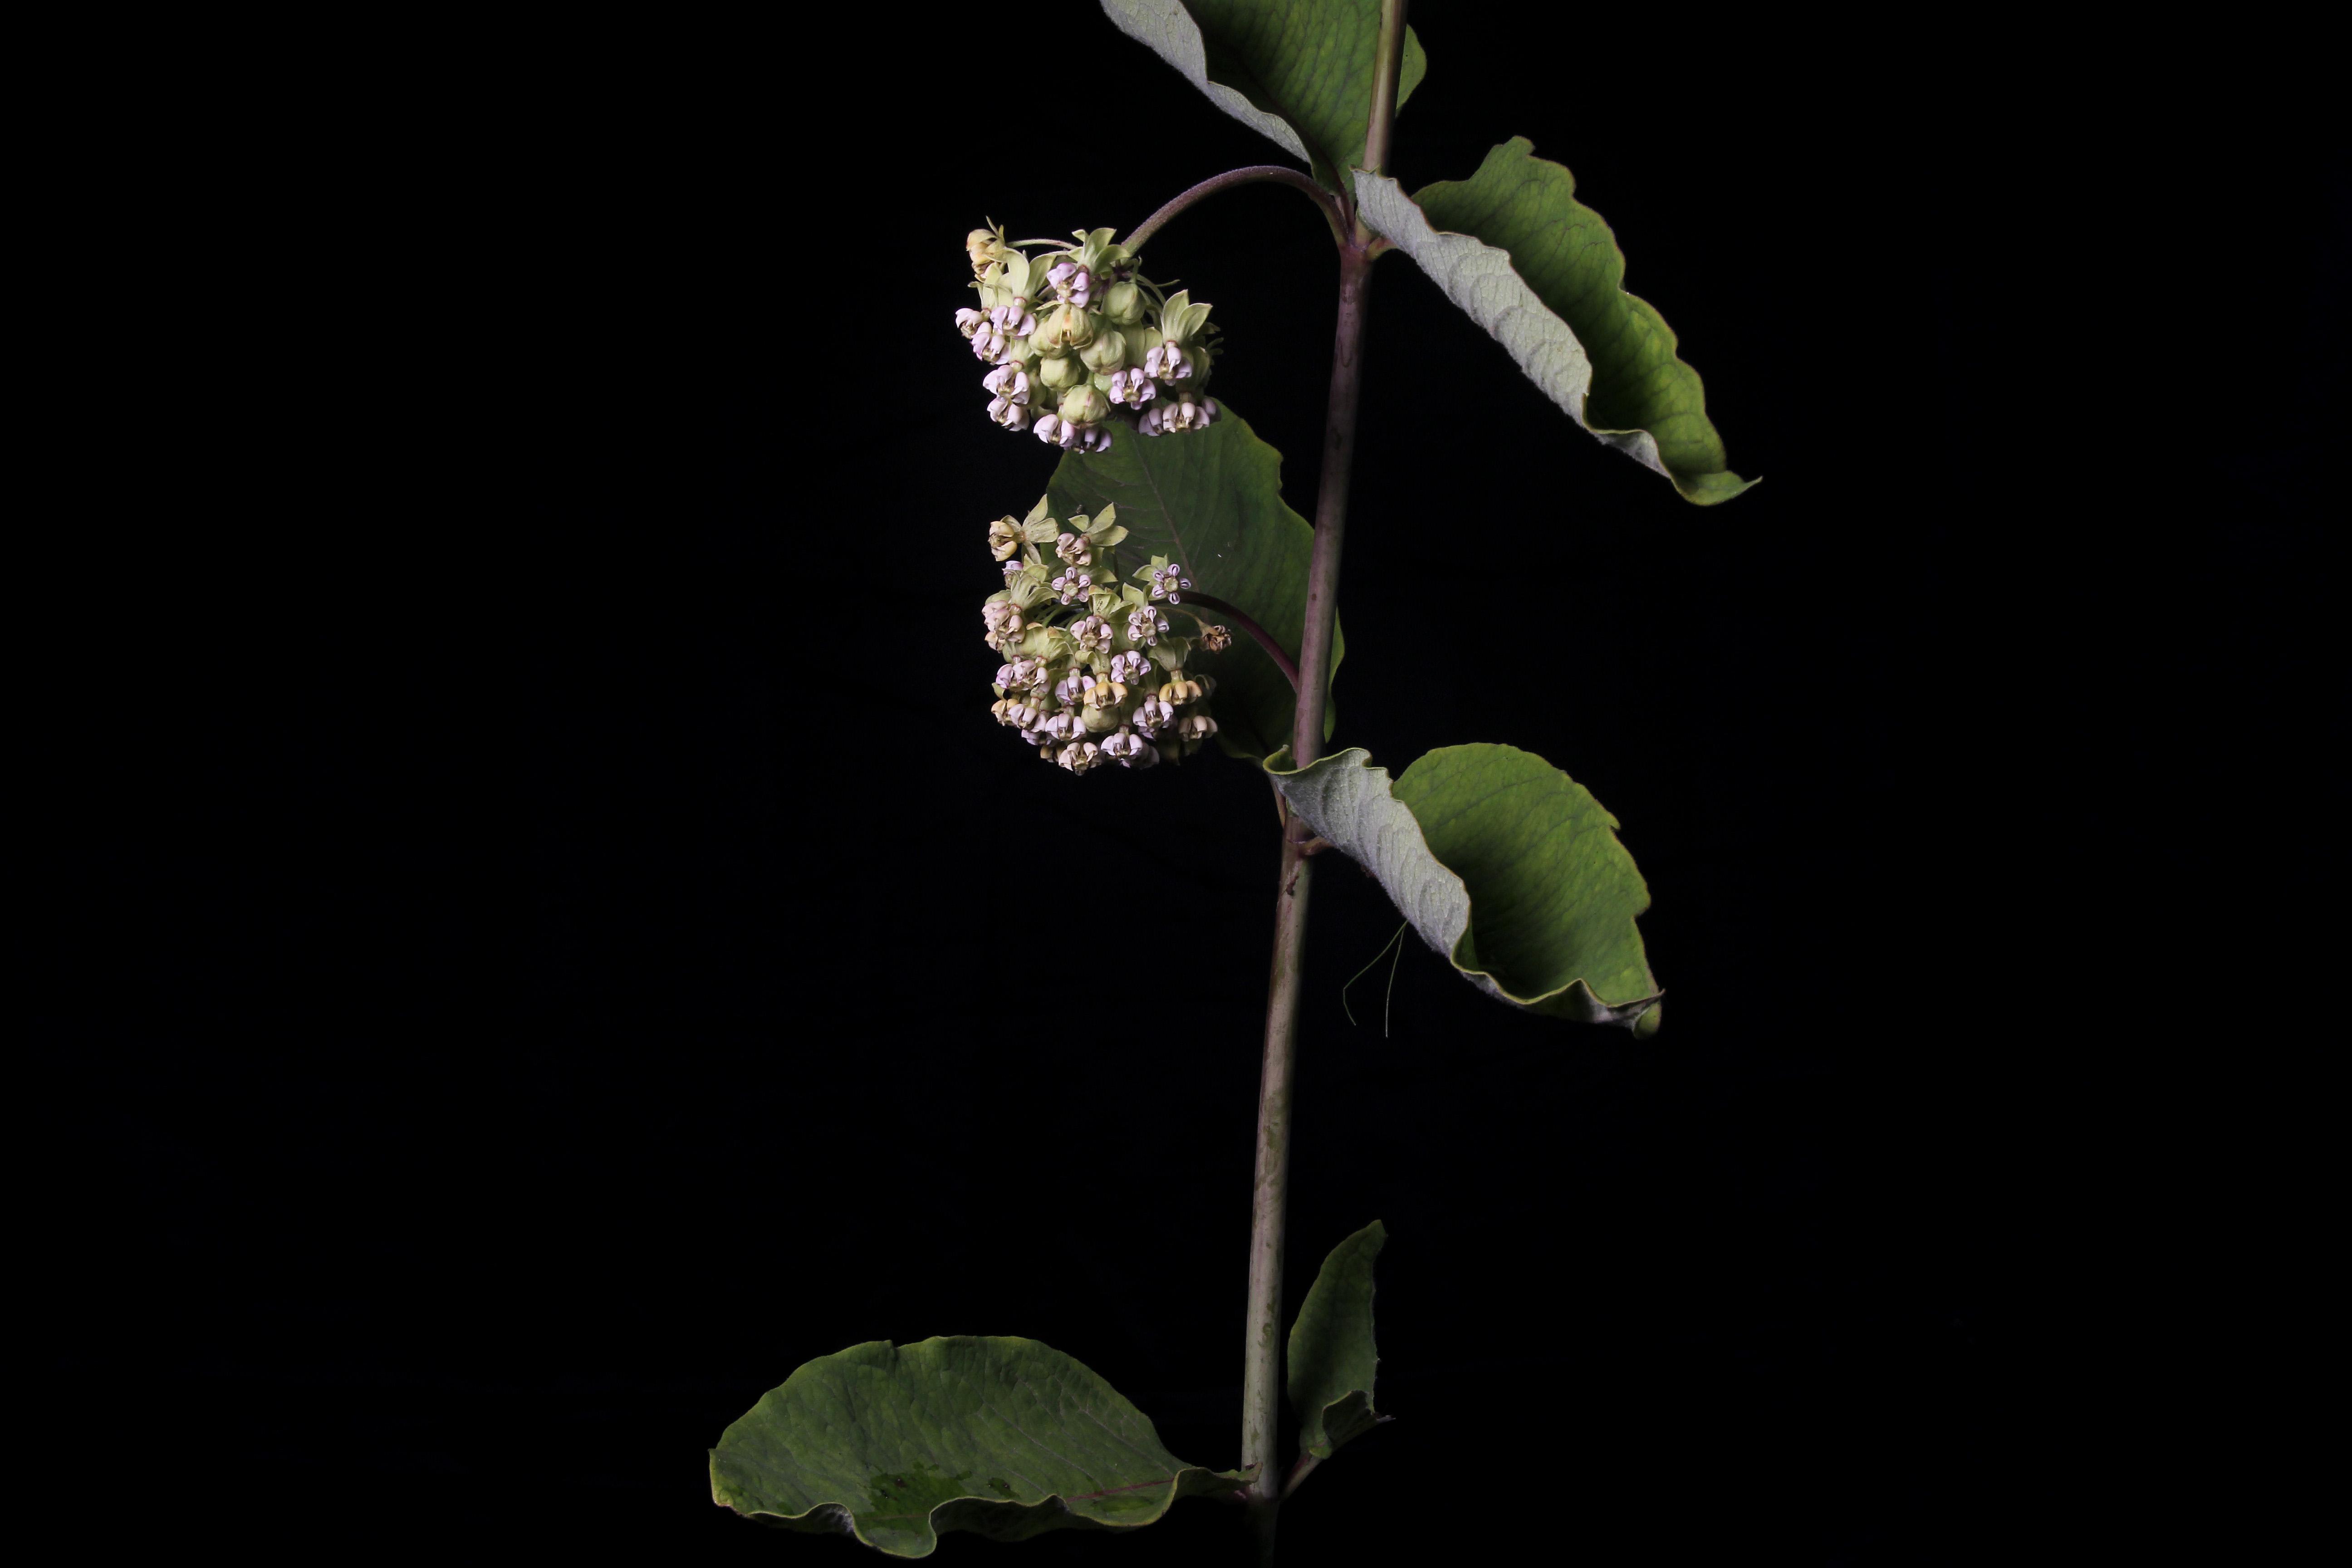 Asclepias similis image